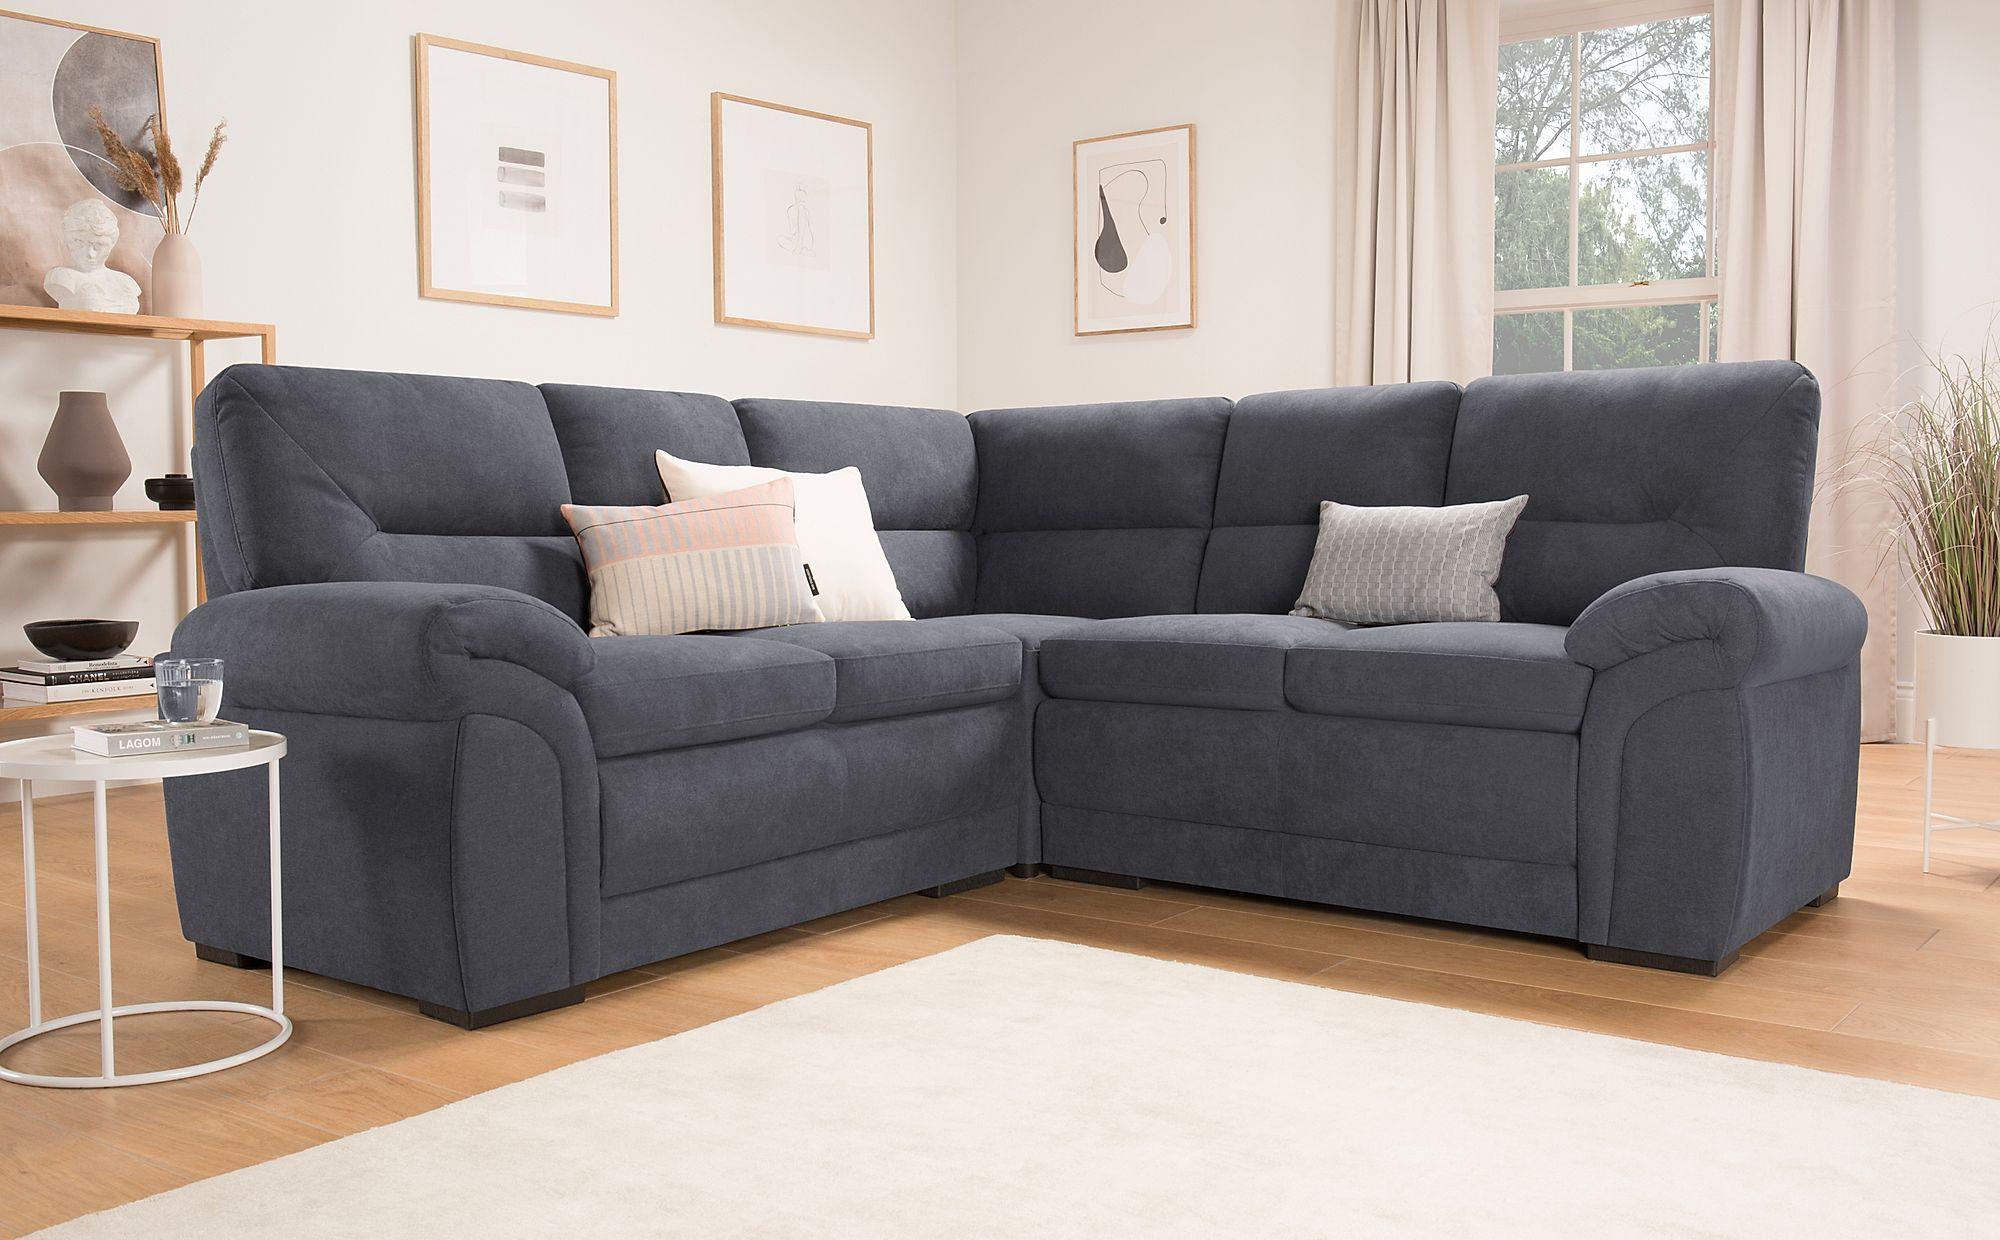 Bromley Slate Grey Plush Fabric Corner Sofa | Furniture Choice Inside Grey Sofa Chairs (View 2 of 15)